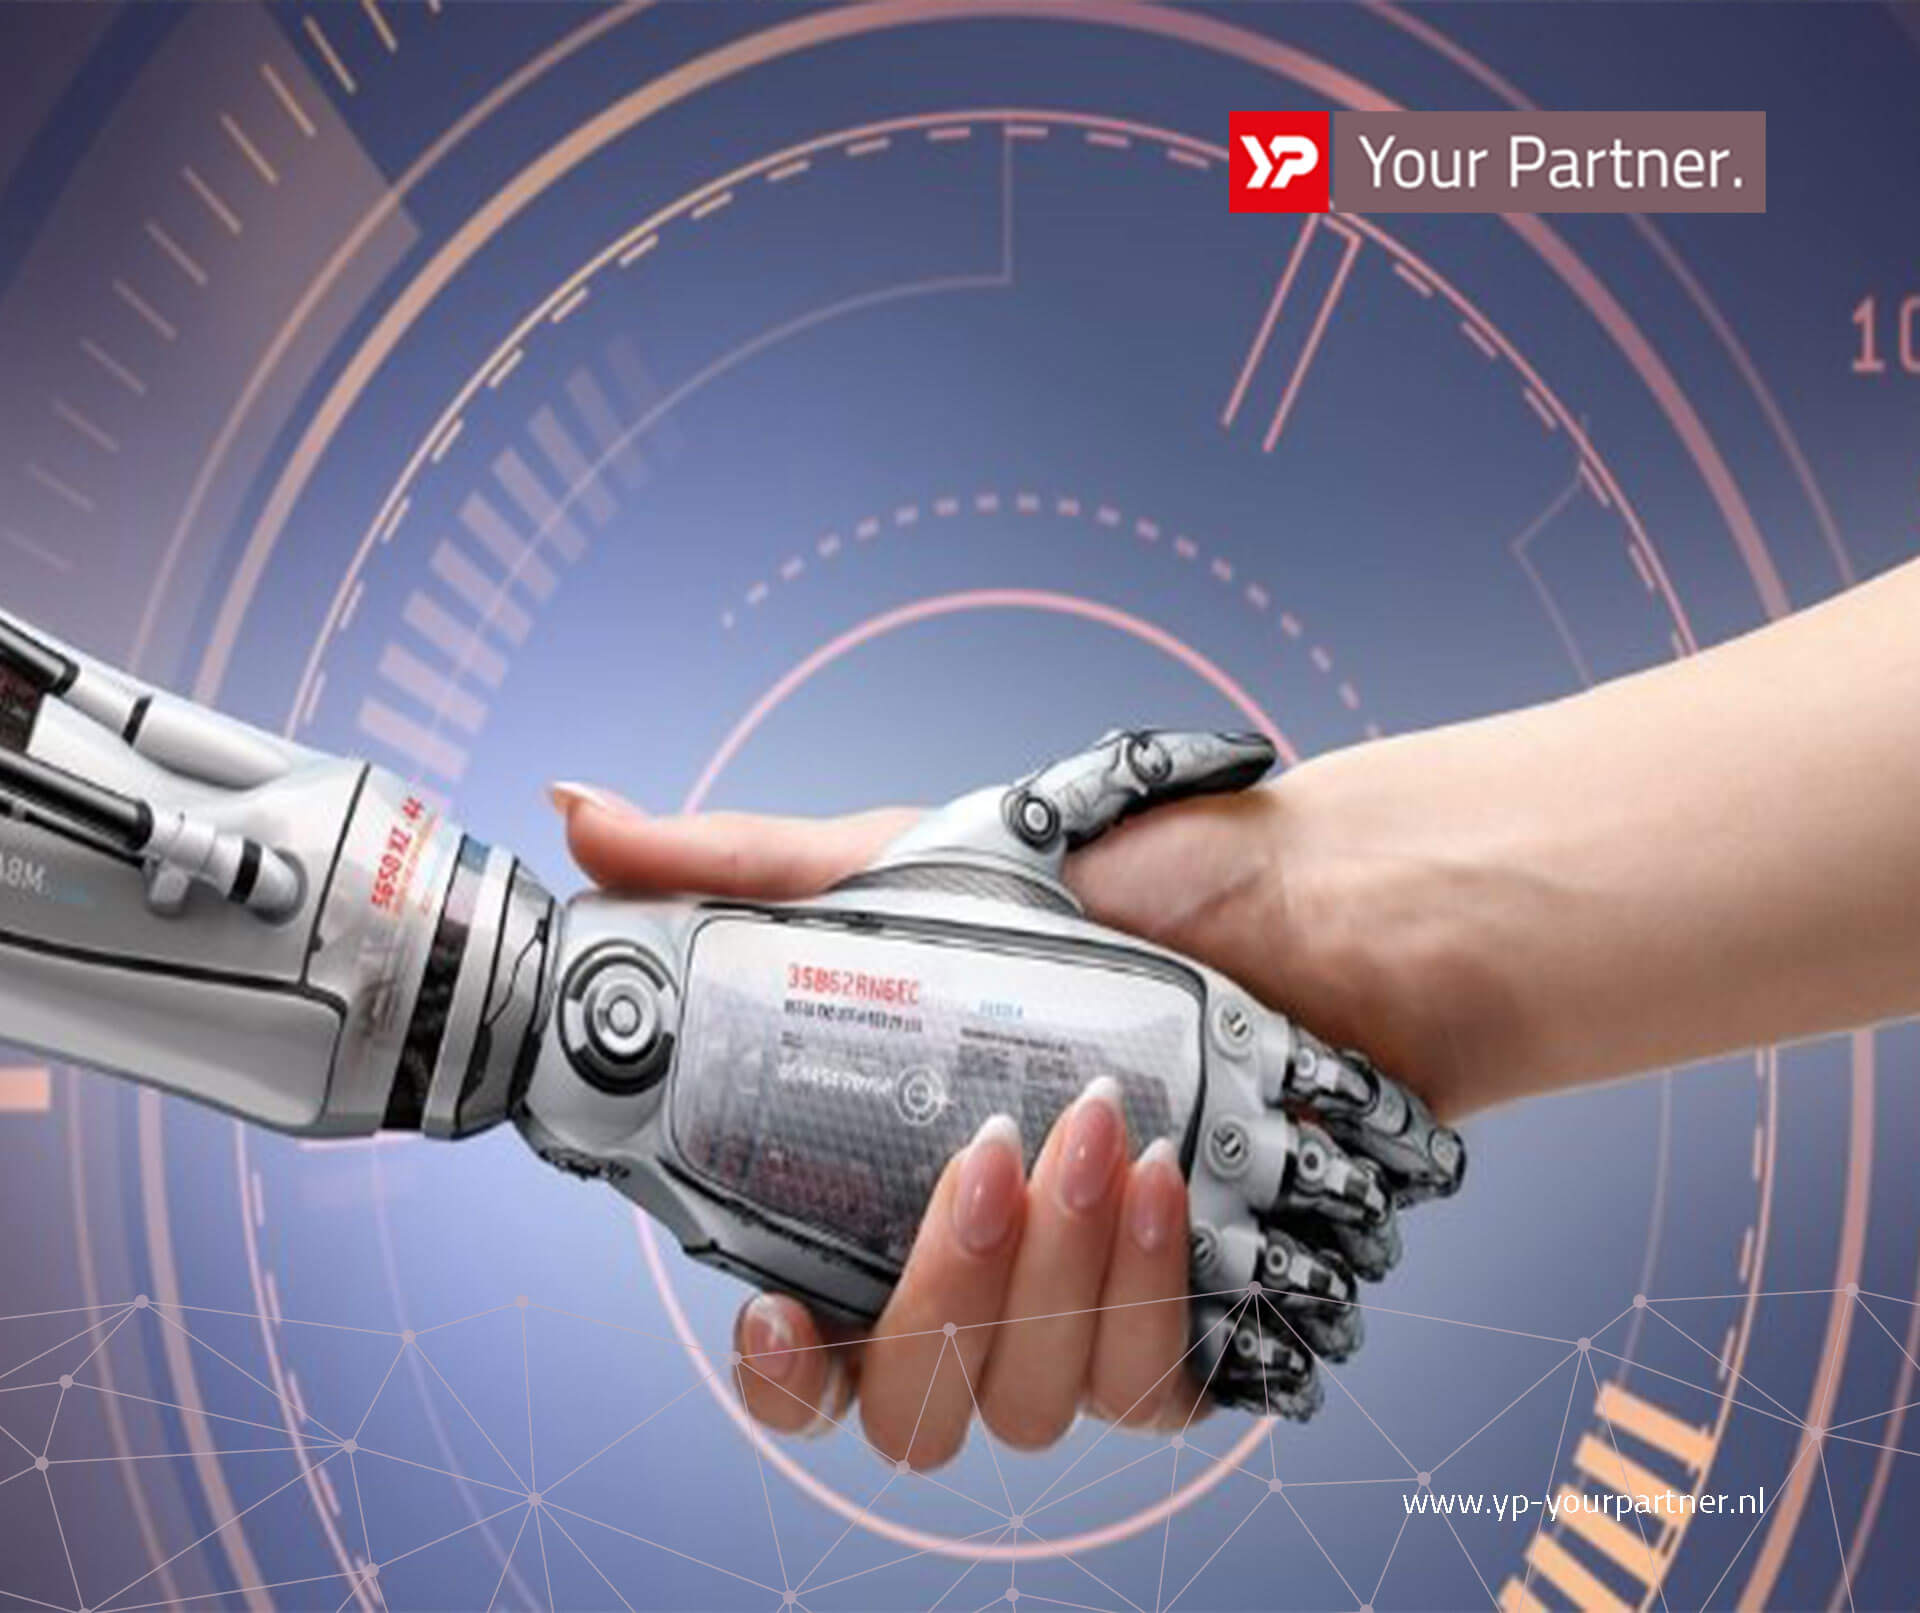 HTCC - YP Your Partner